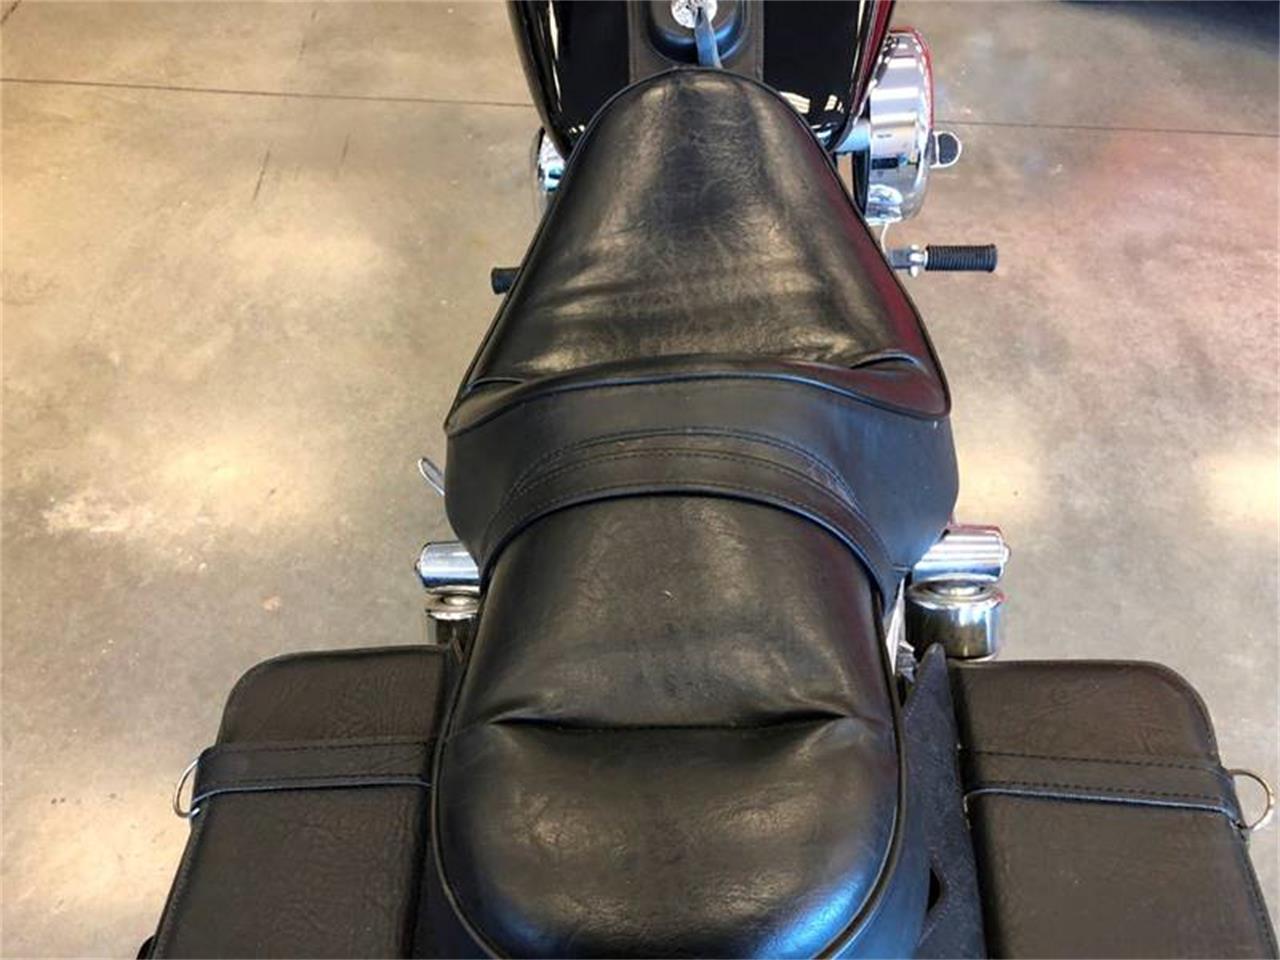 2004 Harley-Davidson Motorcycle (CC-1217504) for sale in Olathe, Kansas